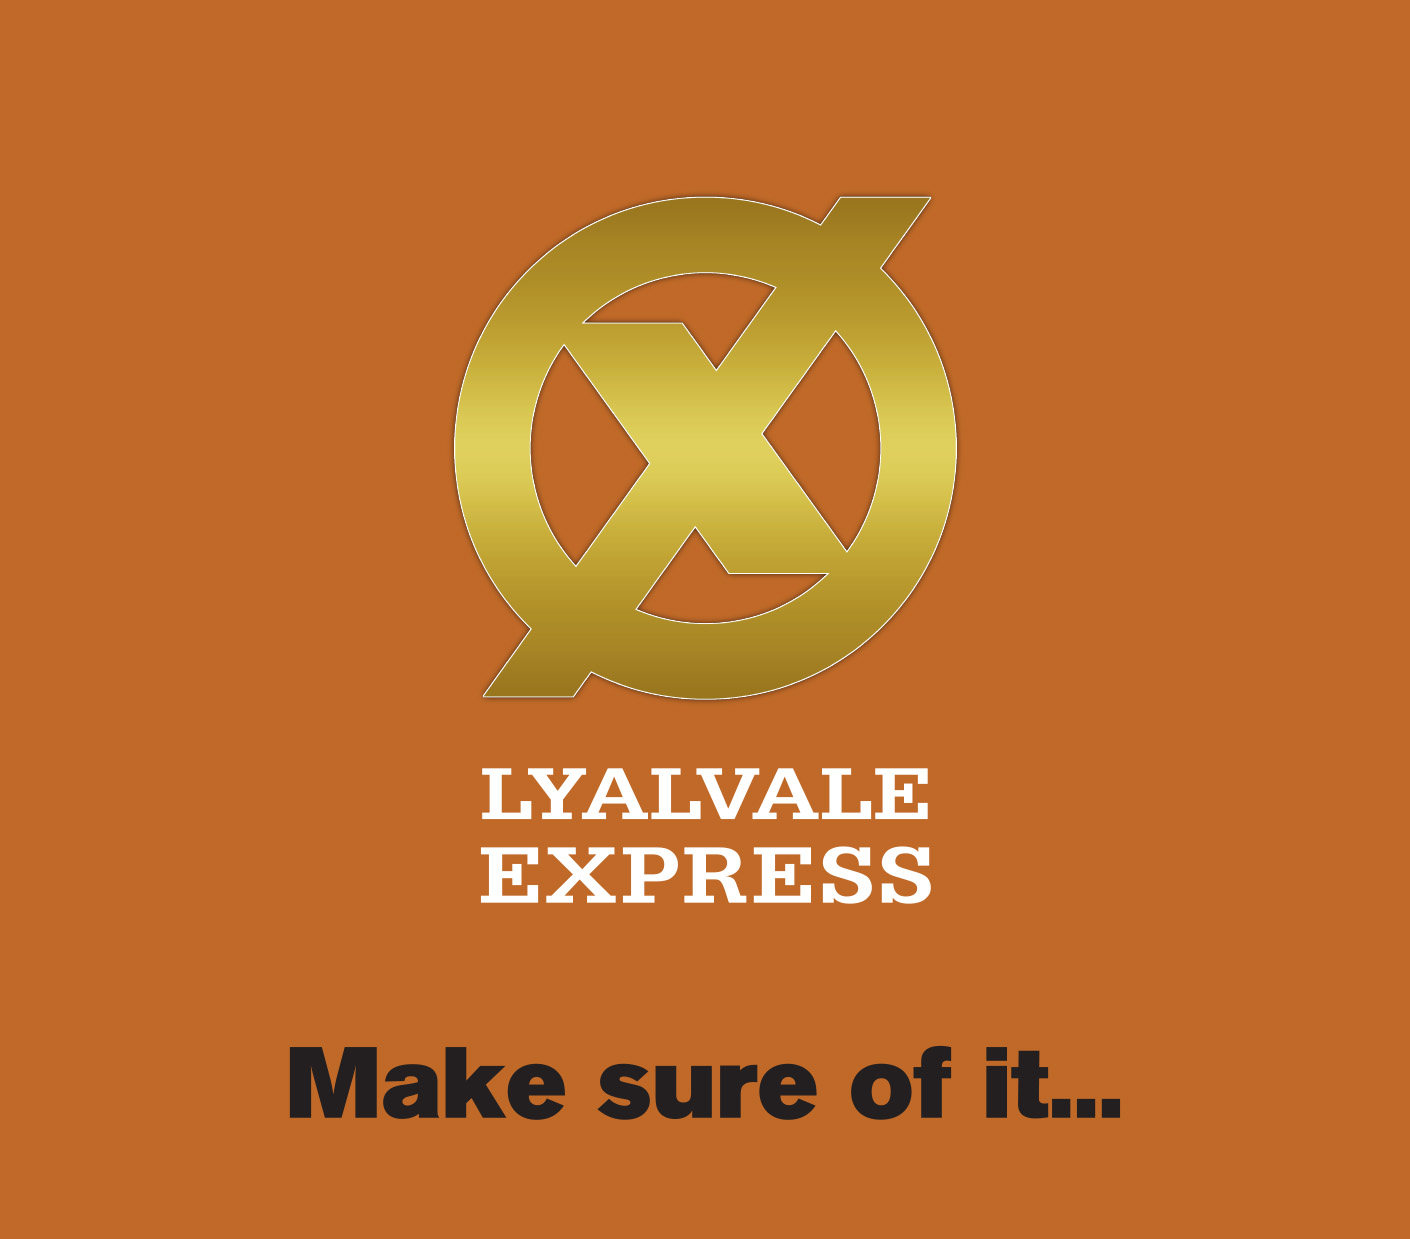 lyalvale-express_logo